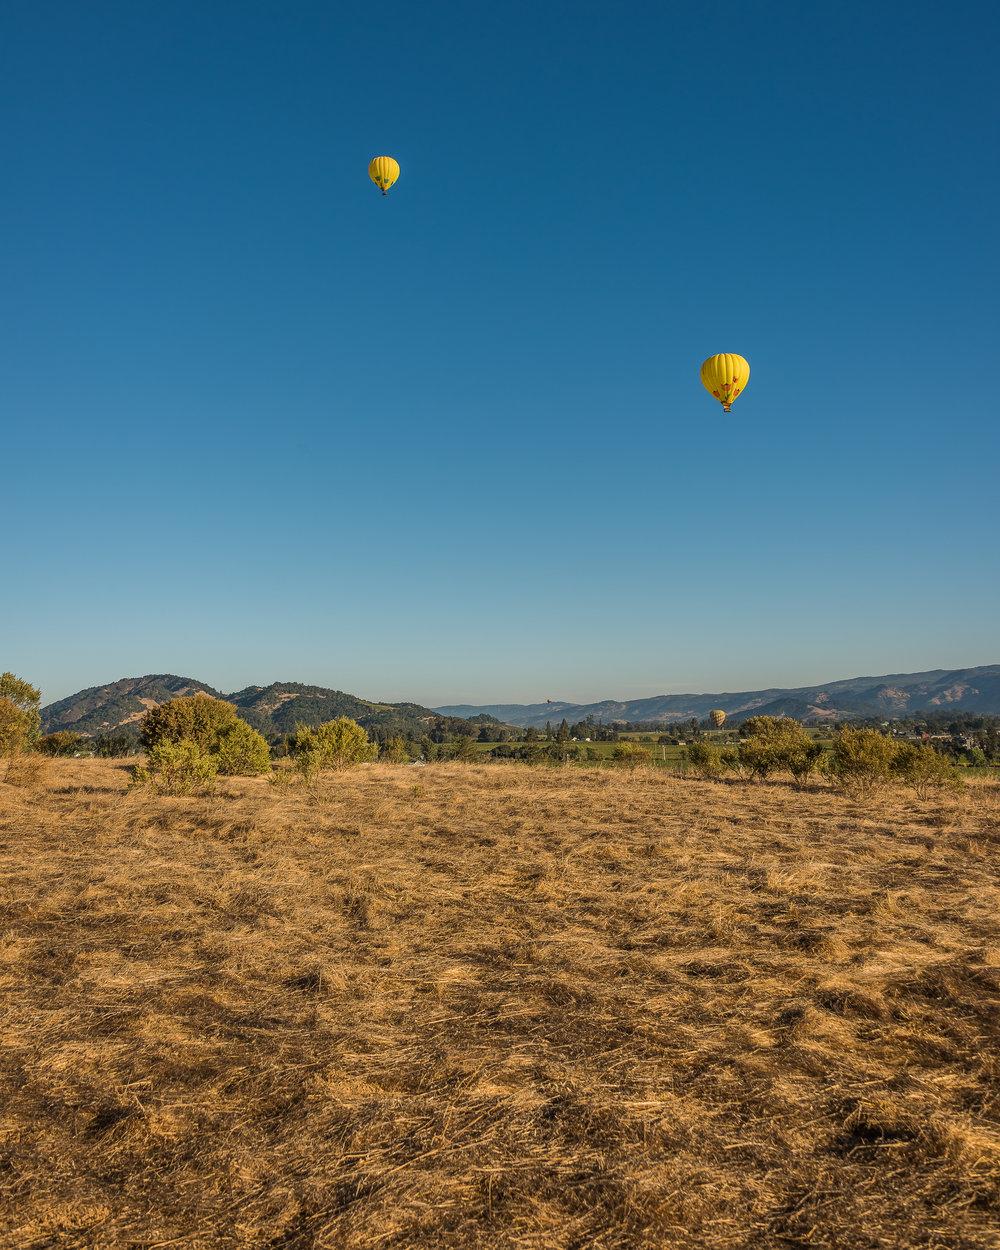 NAPA-Baloon-87.jpg